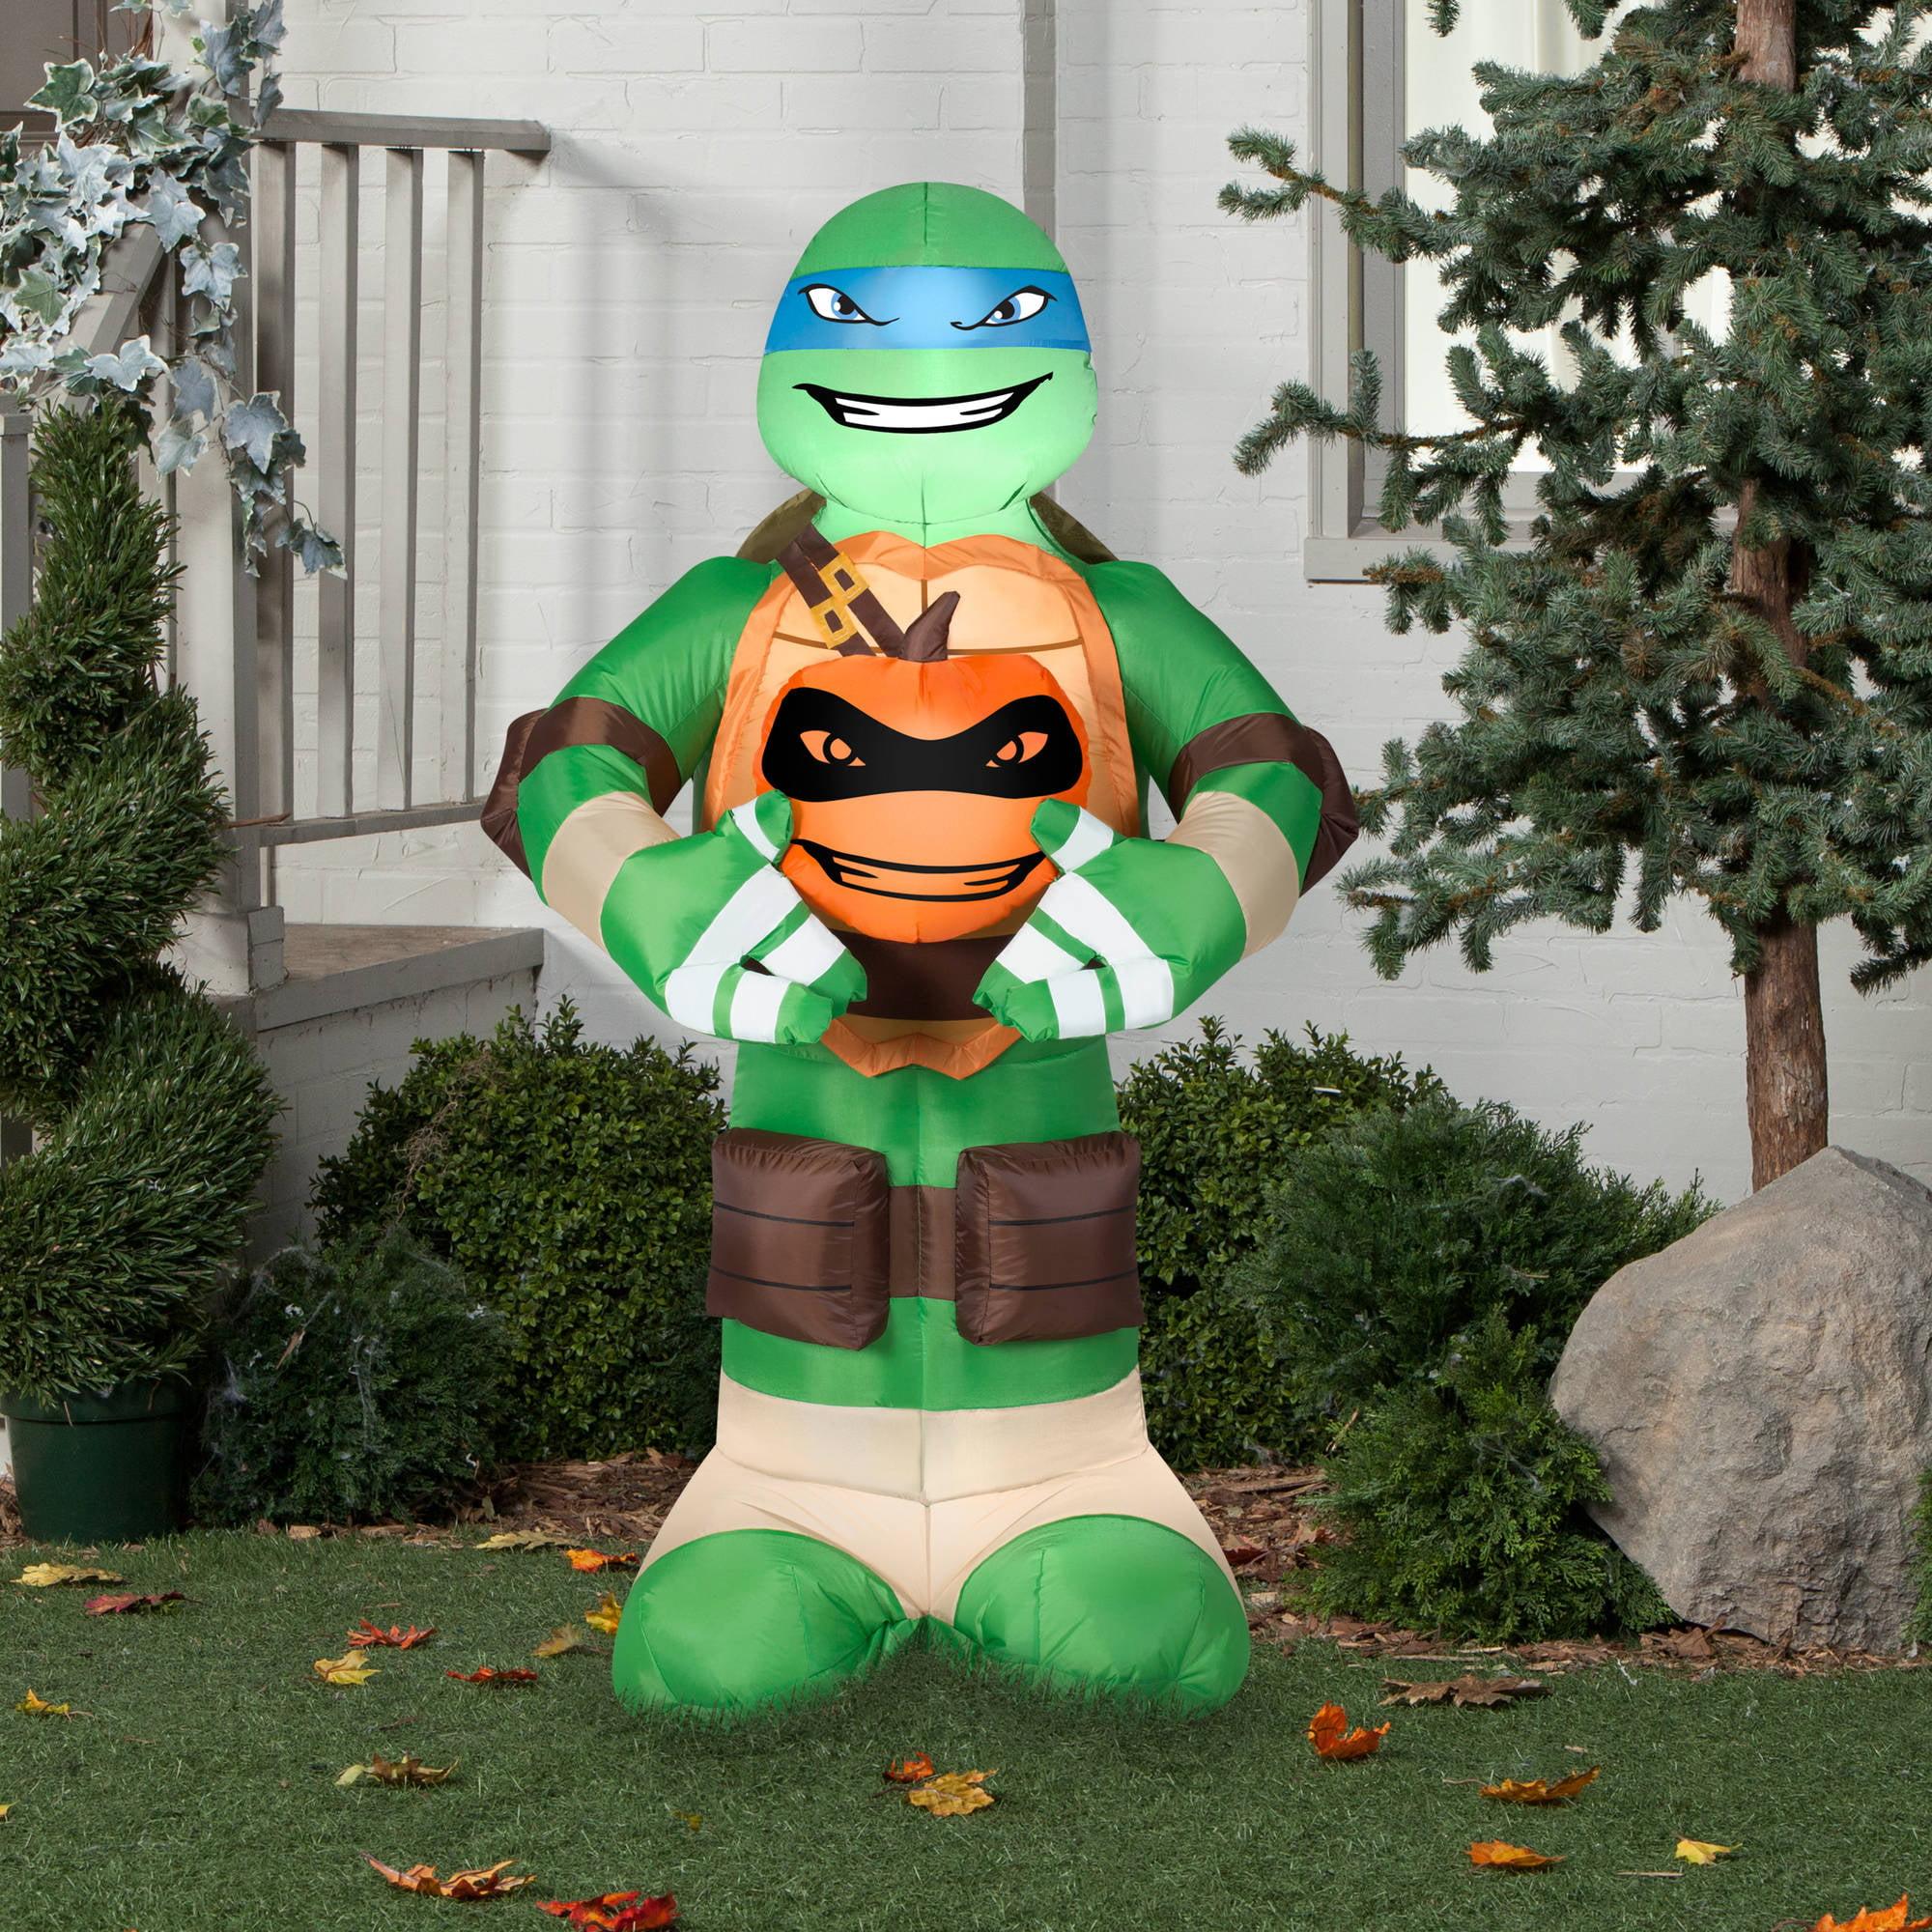 gemmy airblown inflatable 5 x 3 teenage mutant ninja turtles leonardo with pumpkin halloween decoration walmartcom